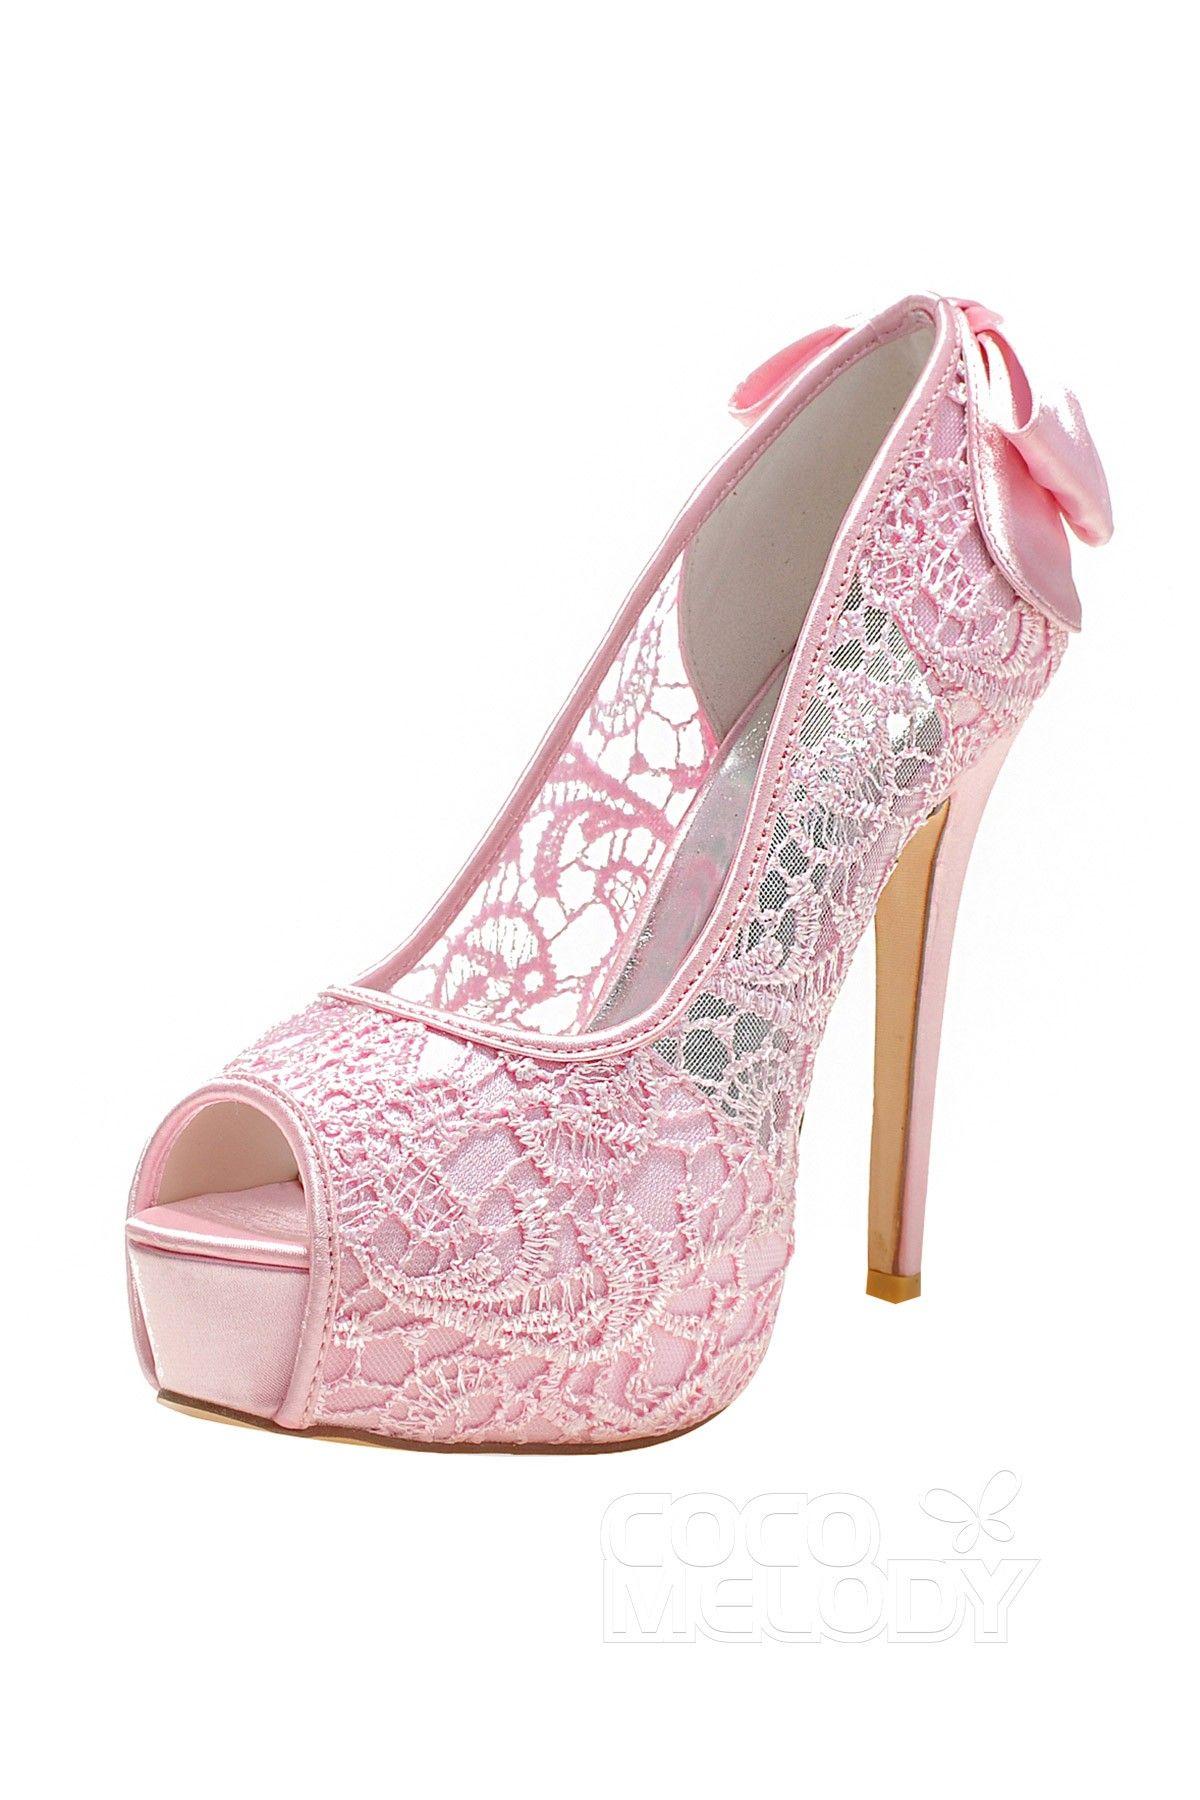 52e44b54a81d Stiletto Heel 12.7cm Heel 2.8cm Platform Lace Bowknot Peep Toe Bridal Shoes  SWS16018  weddingshoes  weddingessentials  weddingaccessories  cocomelody